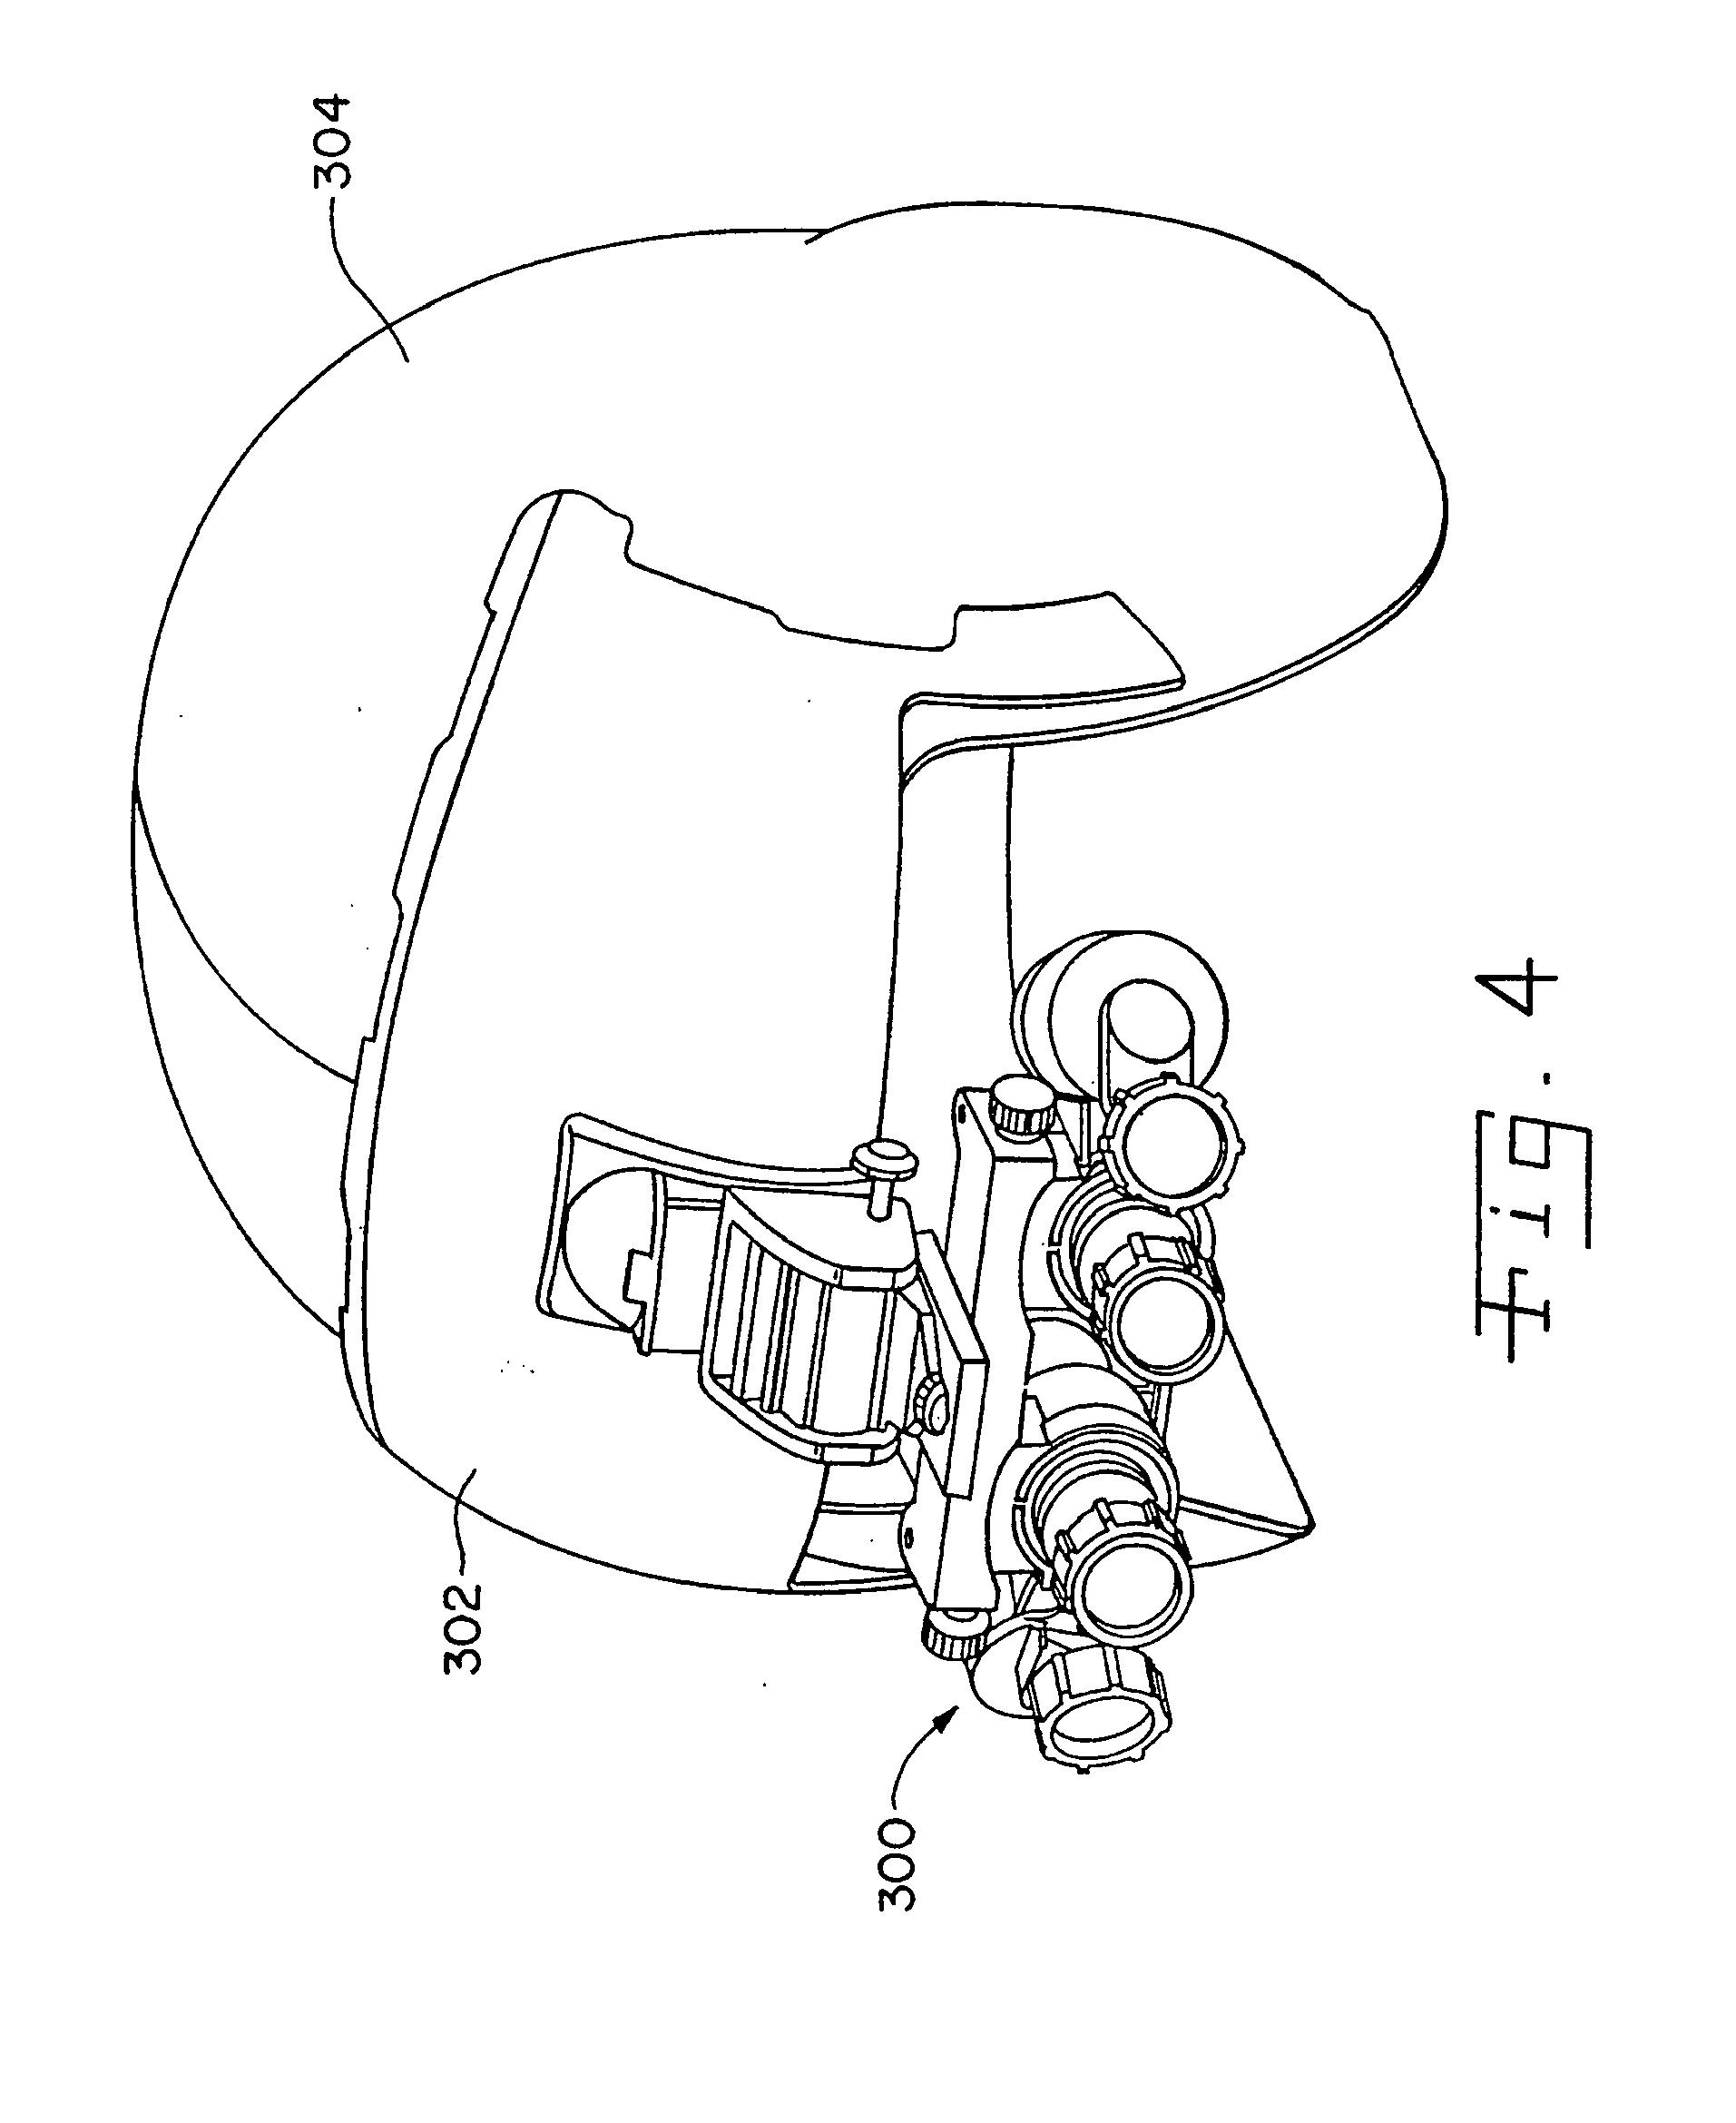 Nice 1992 suzuki 230 wiring diagram sketch electrical and wiring